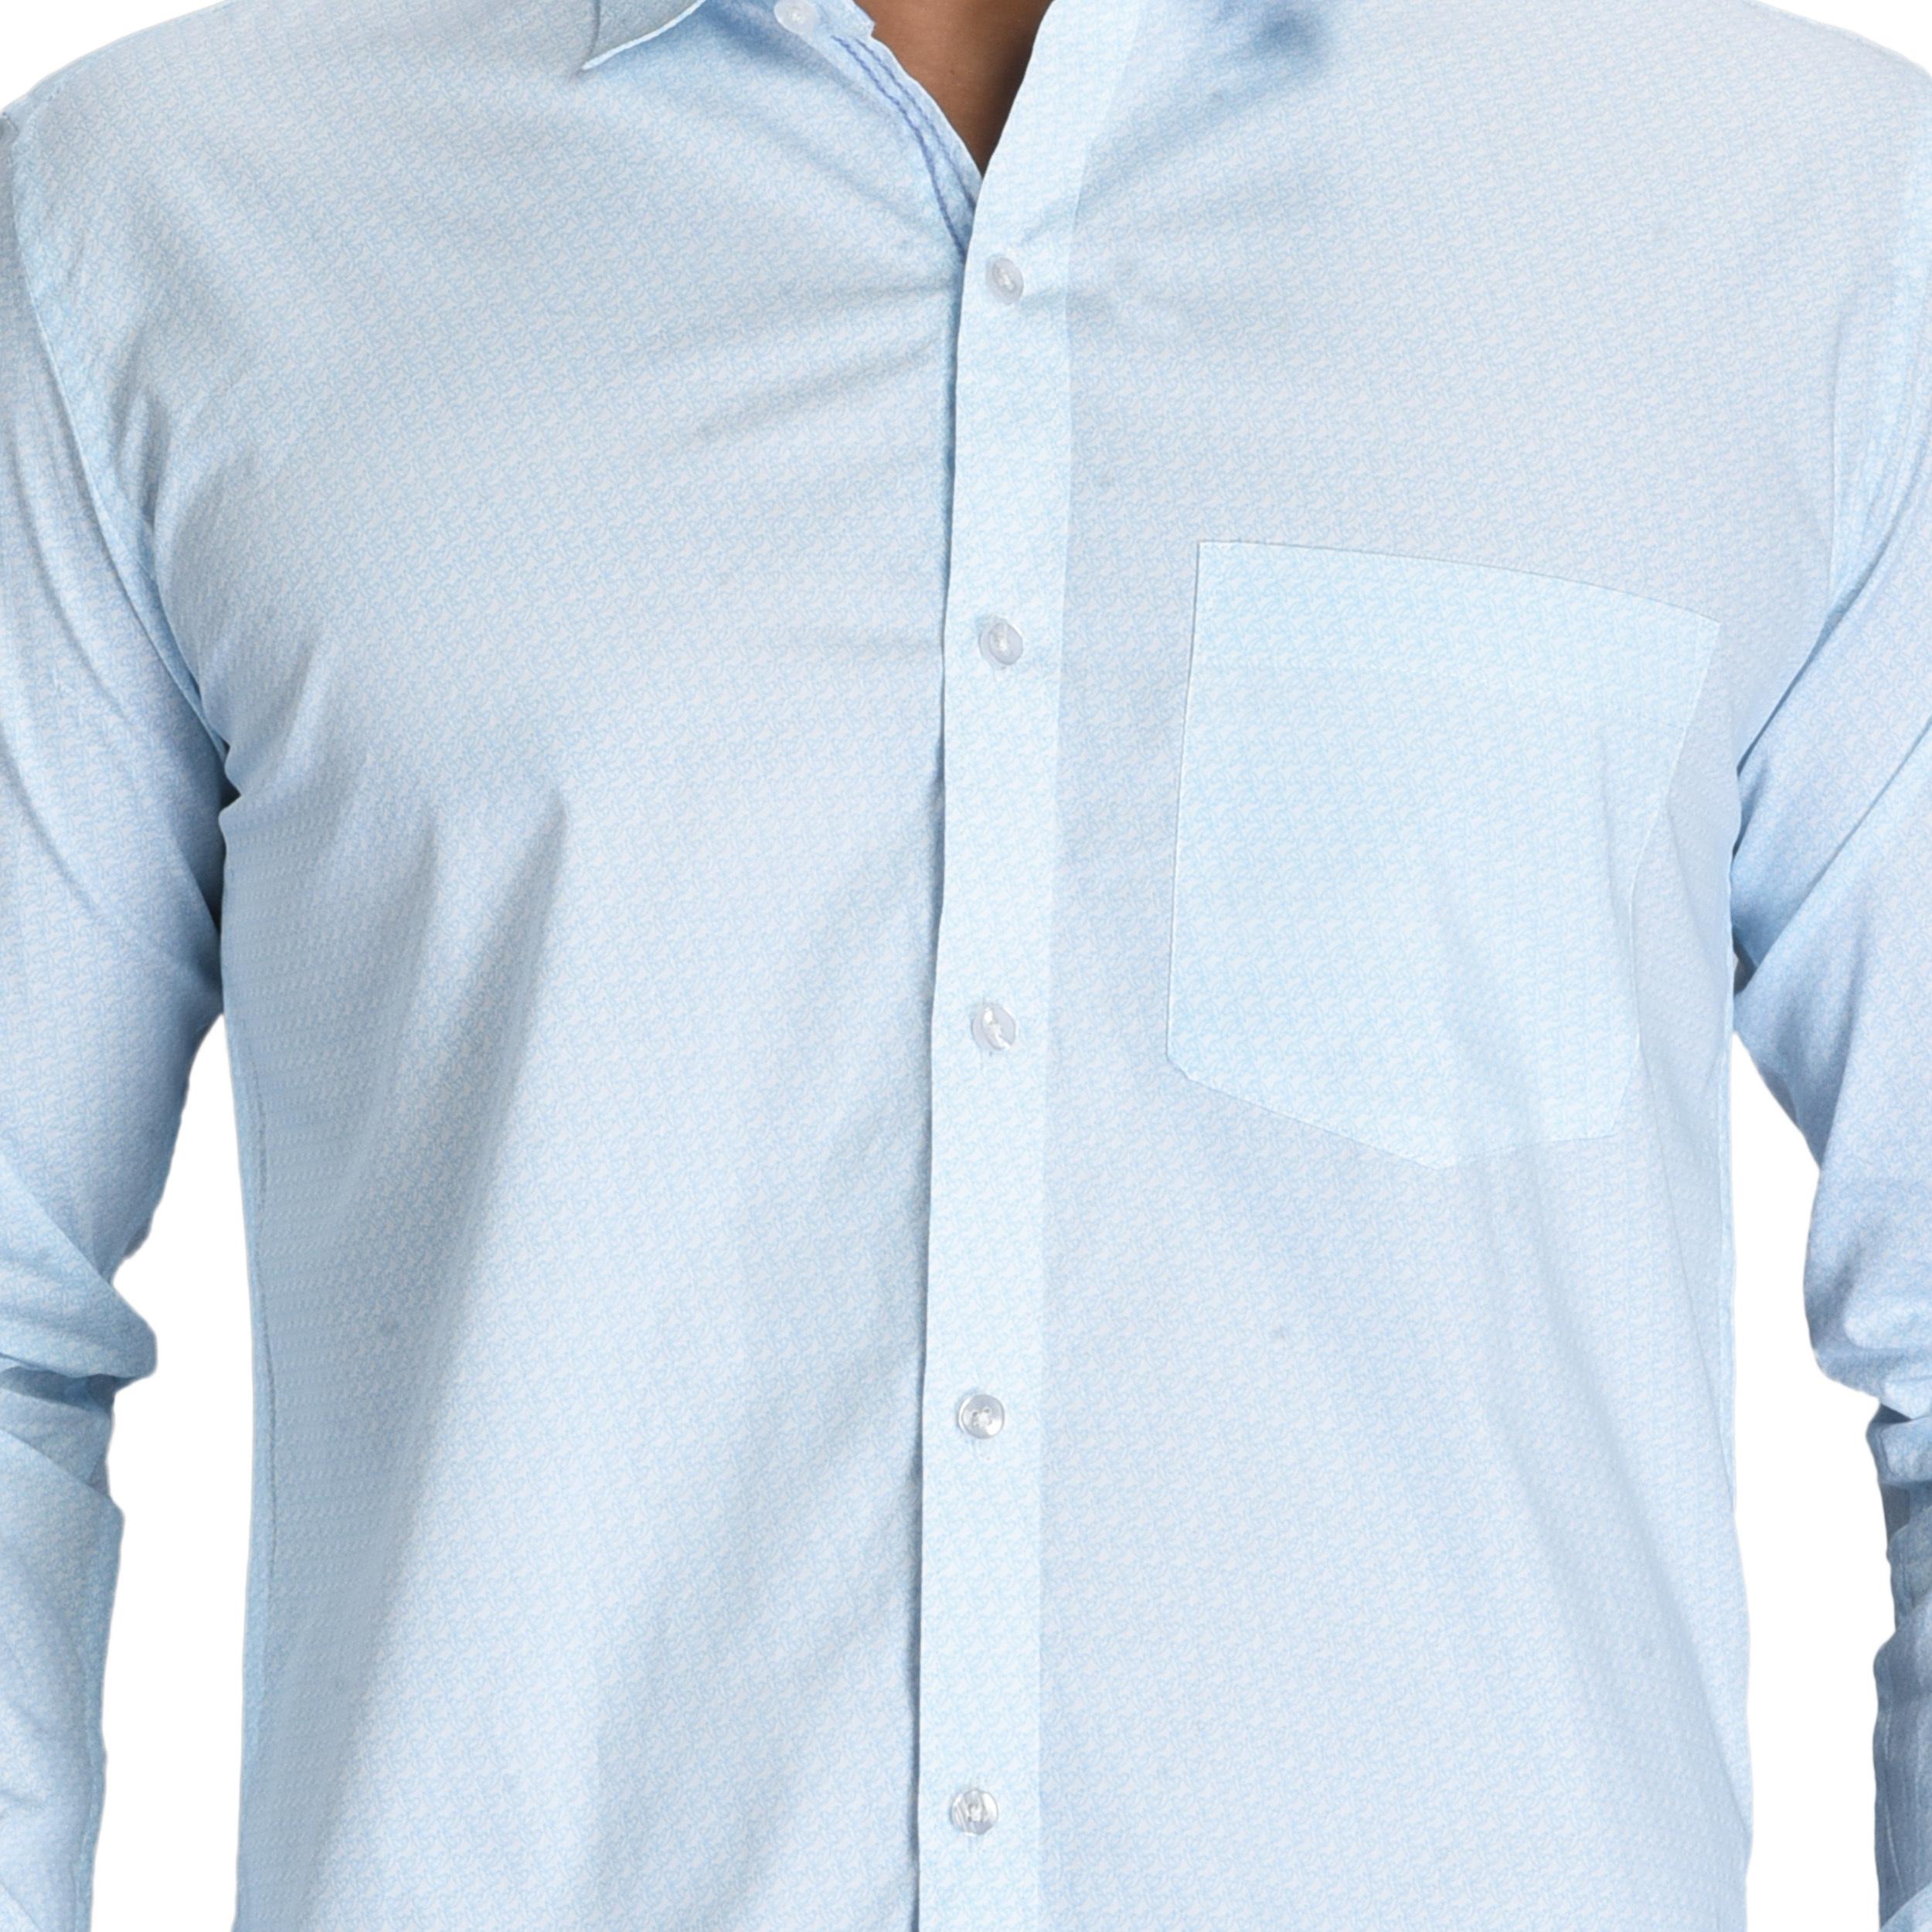 3D Printed Designer Shirt